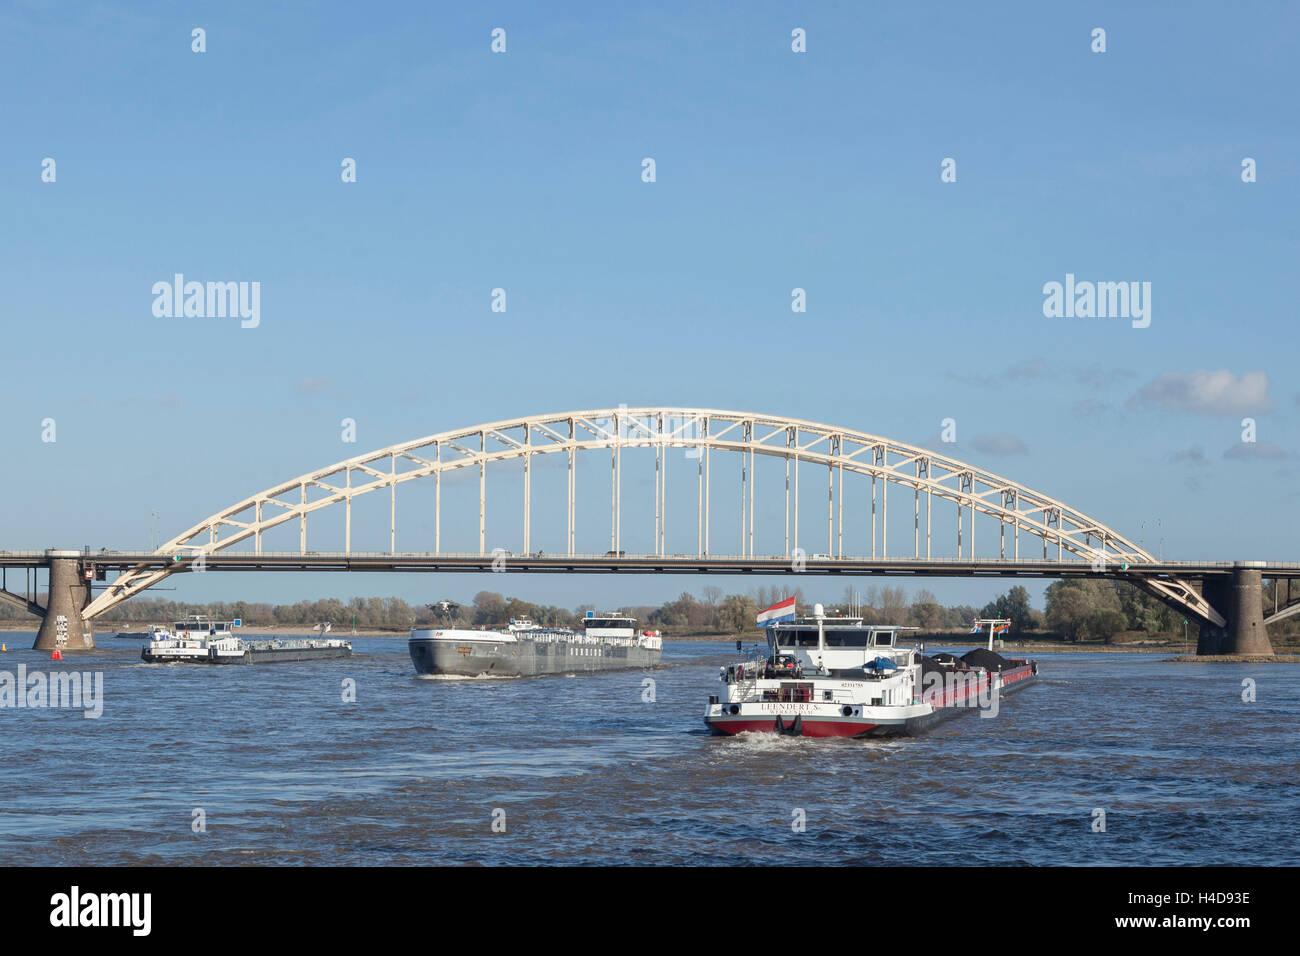 Inland ship with coal charge on the Waal with street bridge Waalbrug, Nijmegen, monetary country, the Netherlands - Stock Image